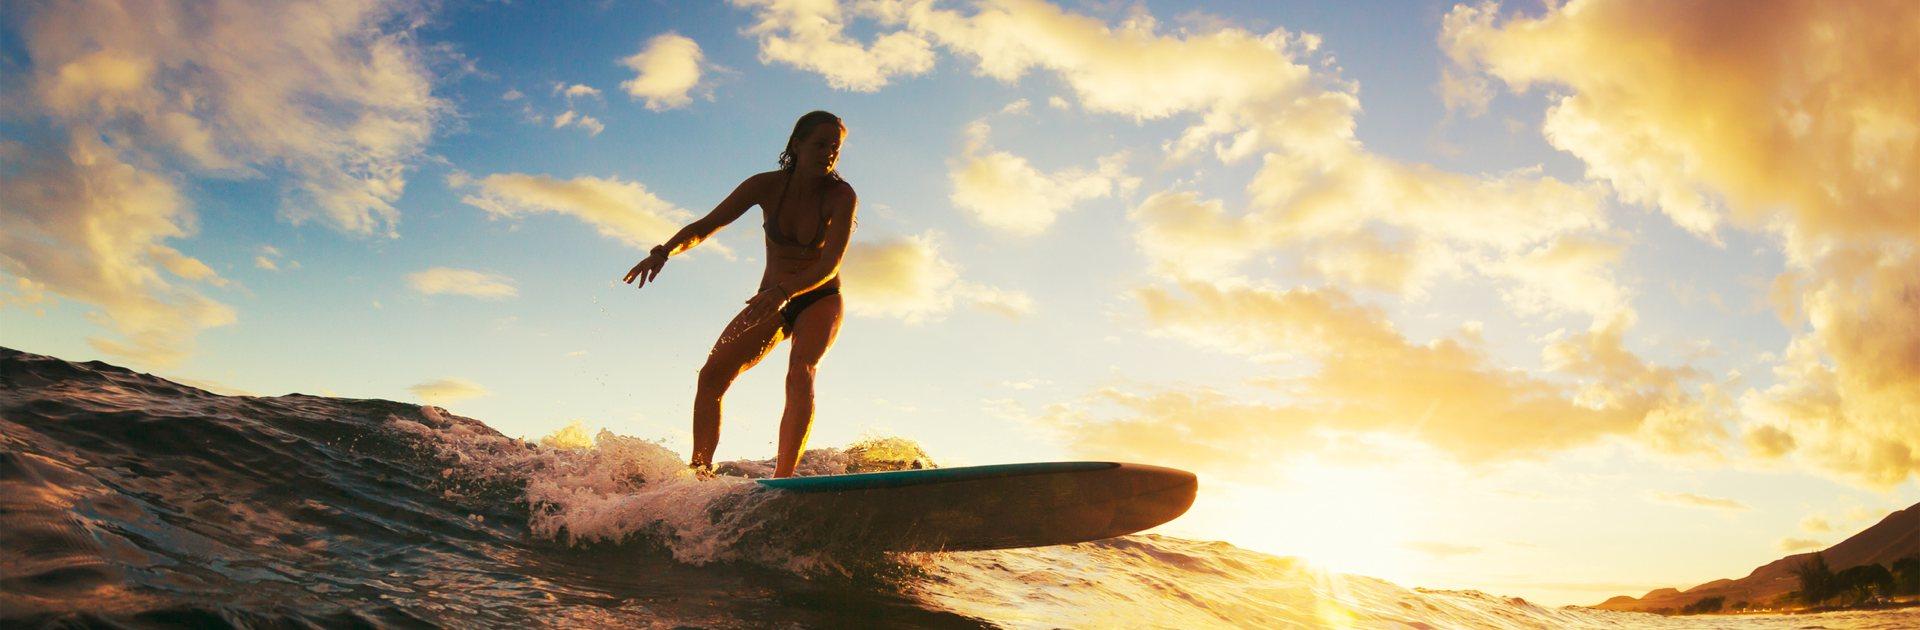 Surfbord Verleih Surfcamp Conil El Palmar